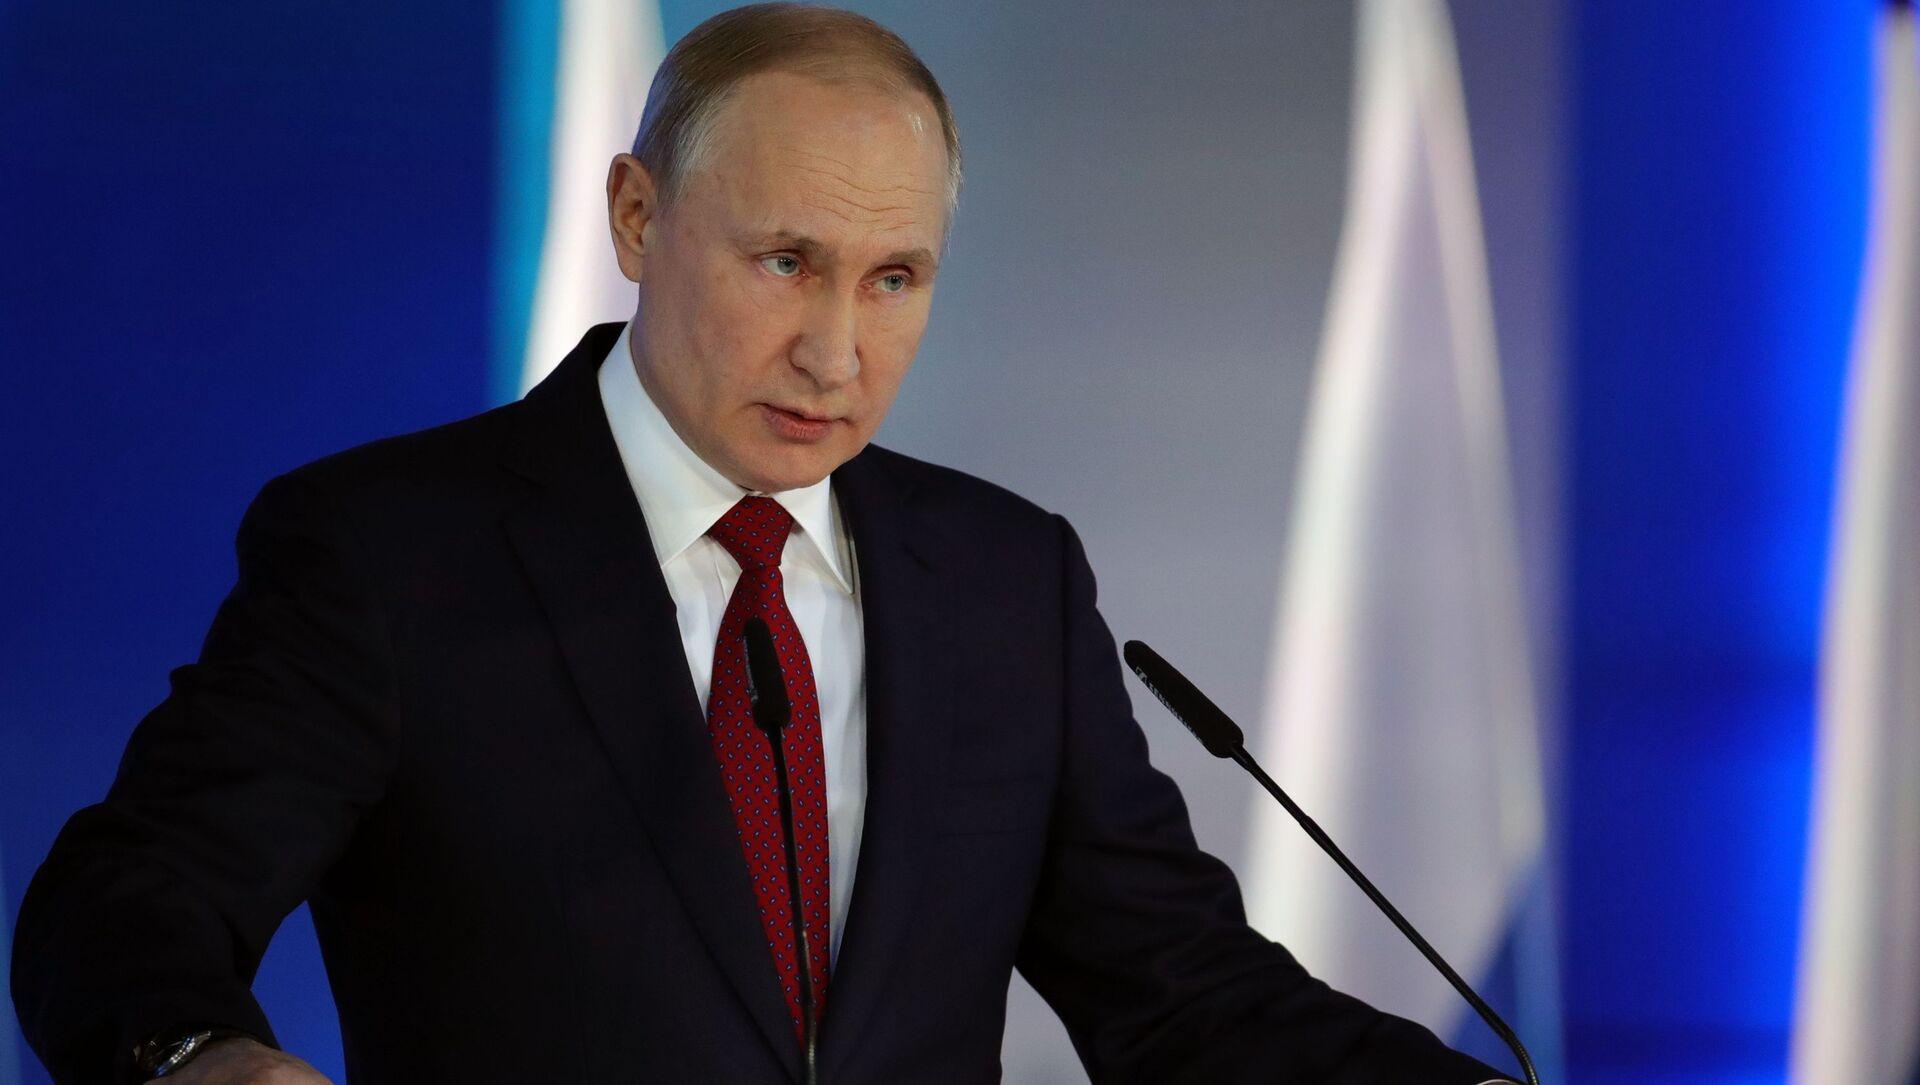 Tổng thống Nga Vladimir Putin. - Sputnik Việt Nam, 1920, 14.04.2021